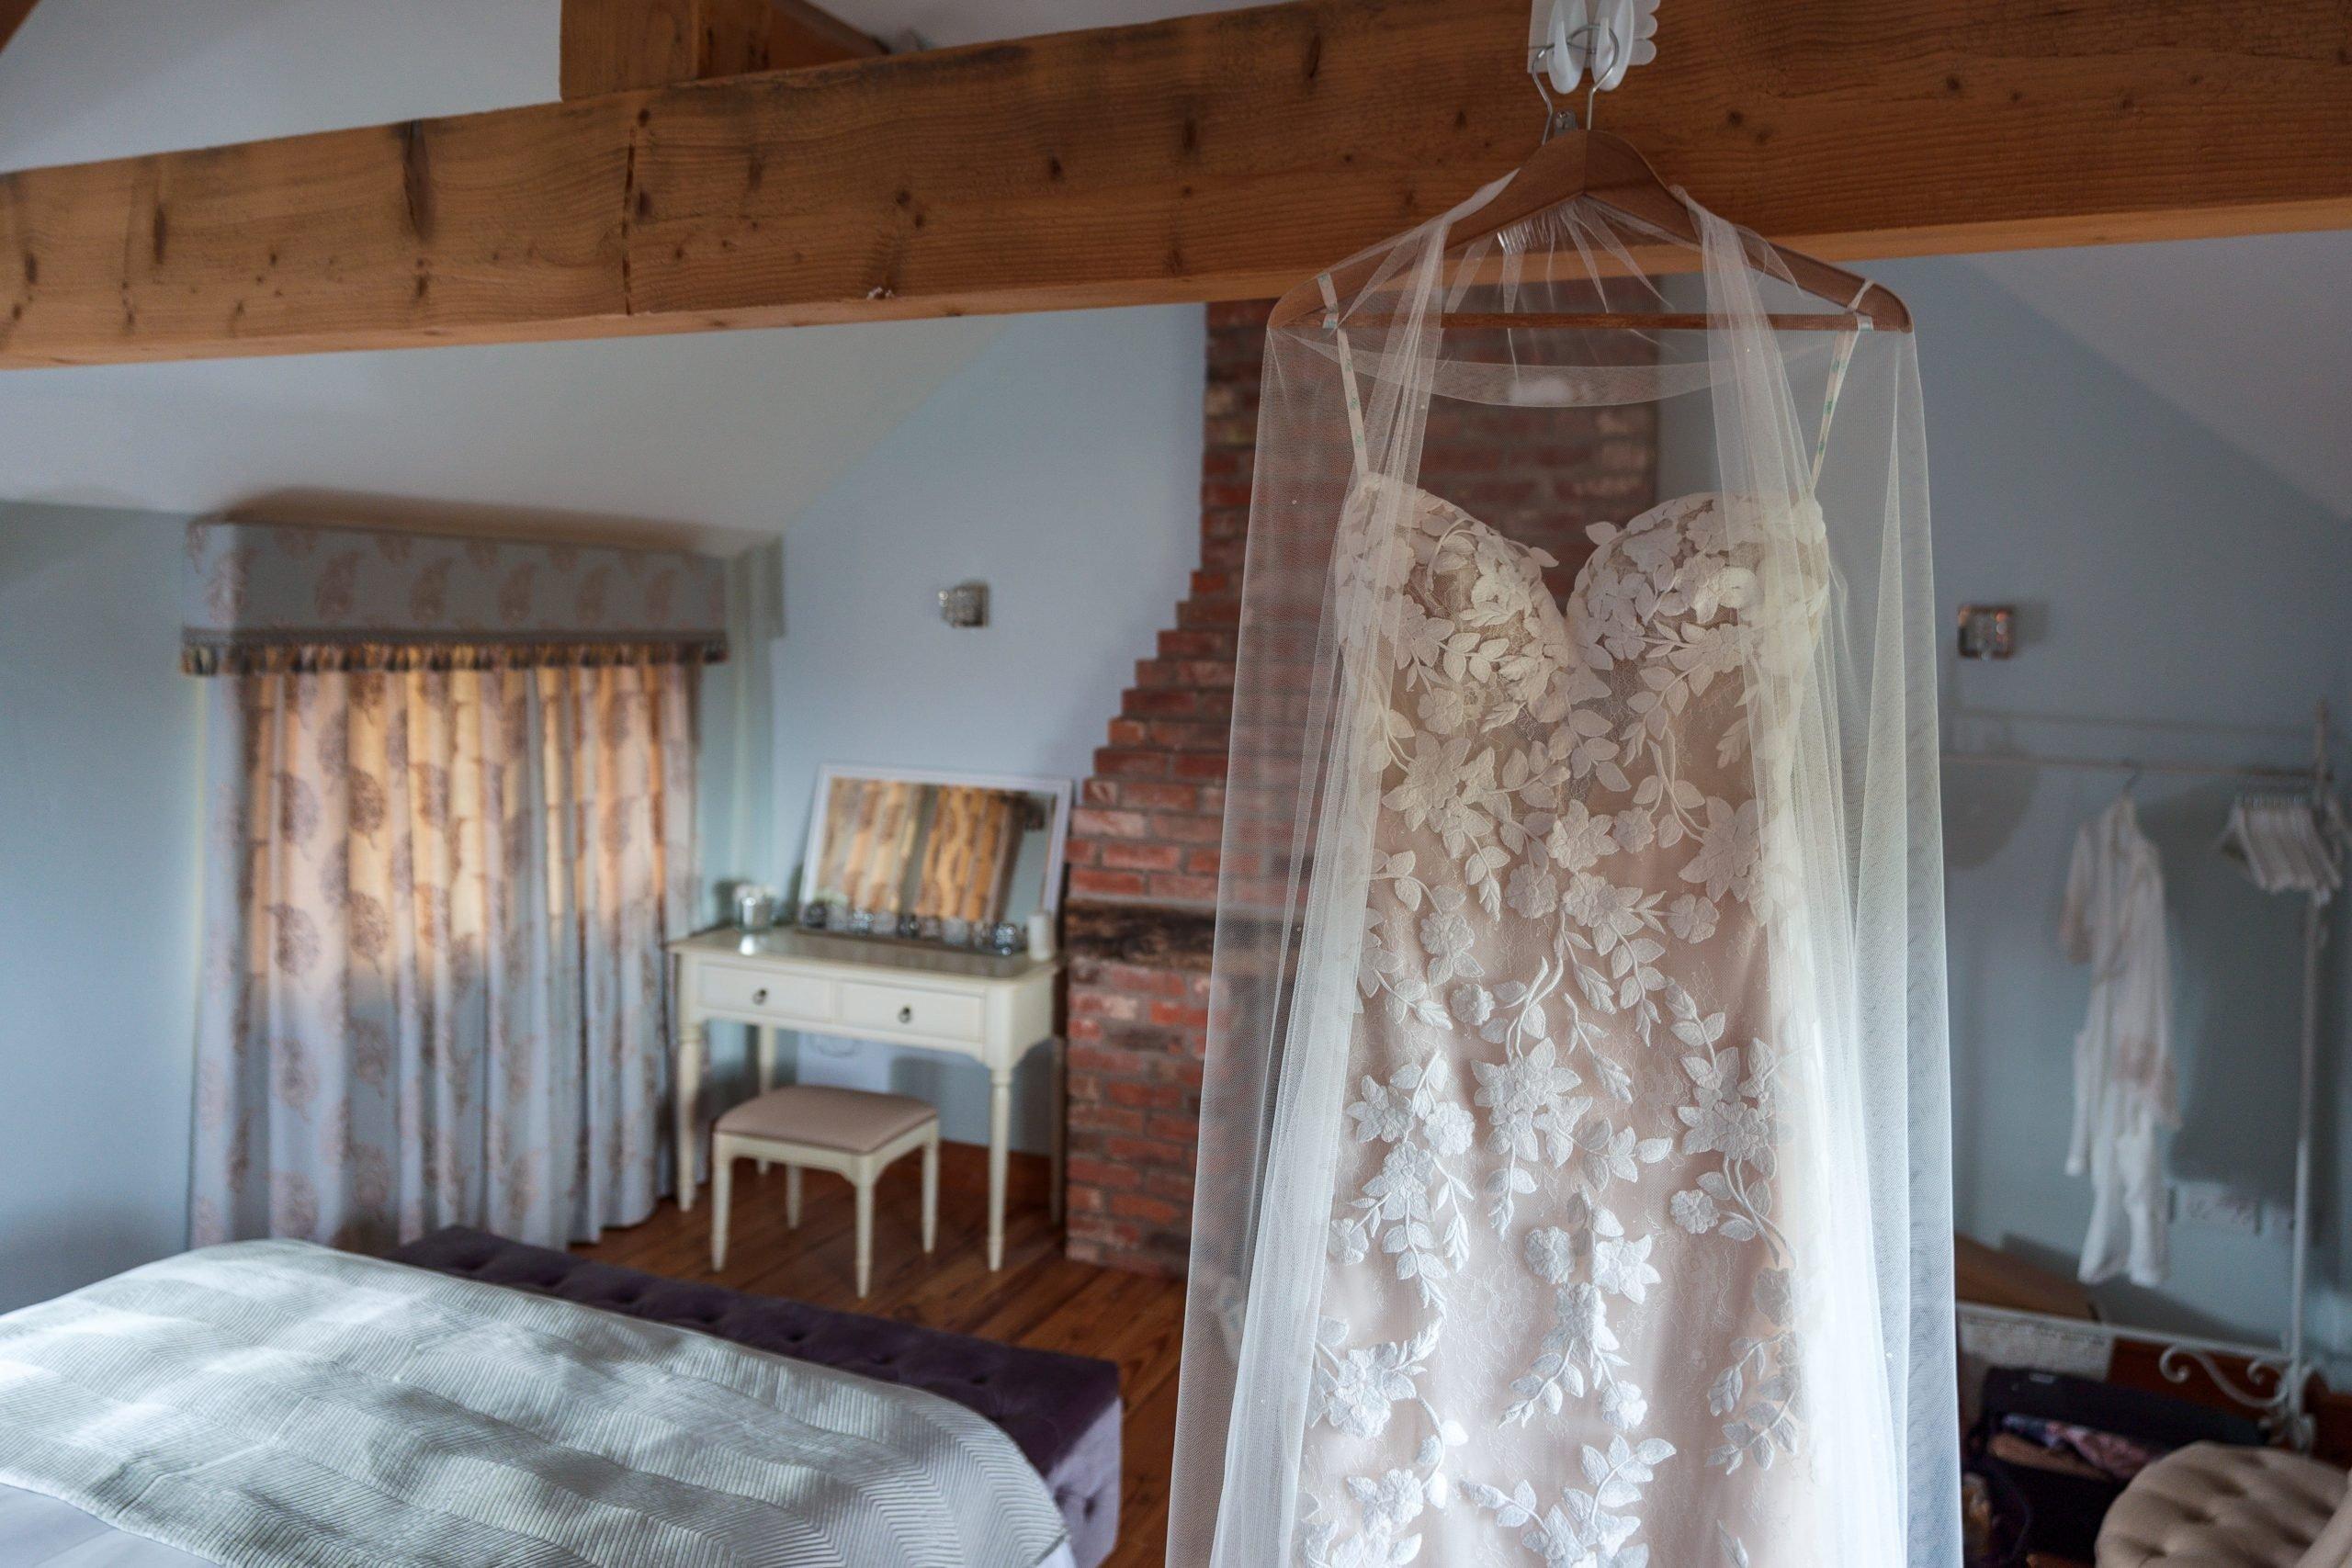 YFFUK Phil Endicott choosing your wedding dress Norton Fields Atherstone